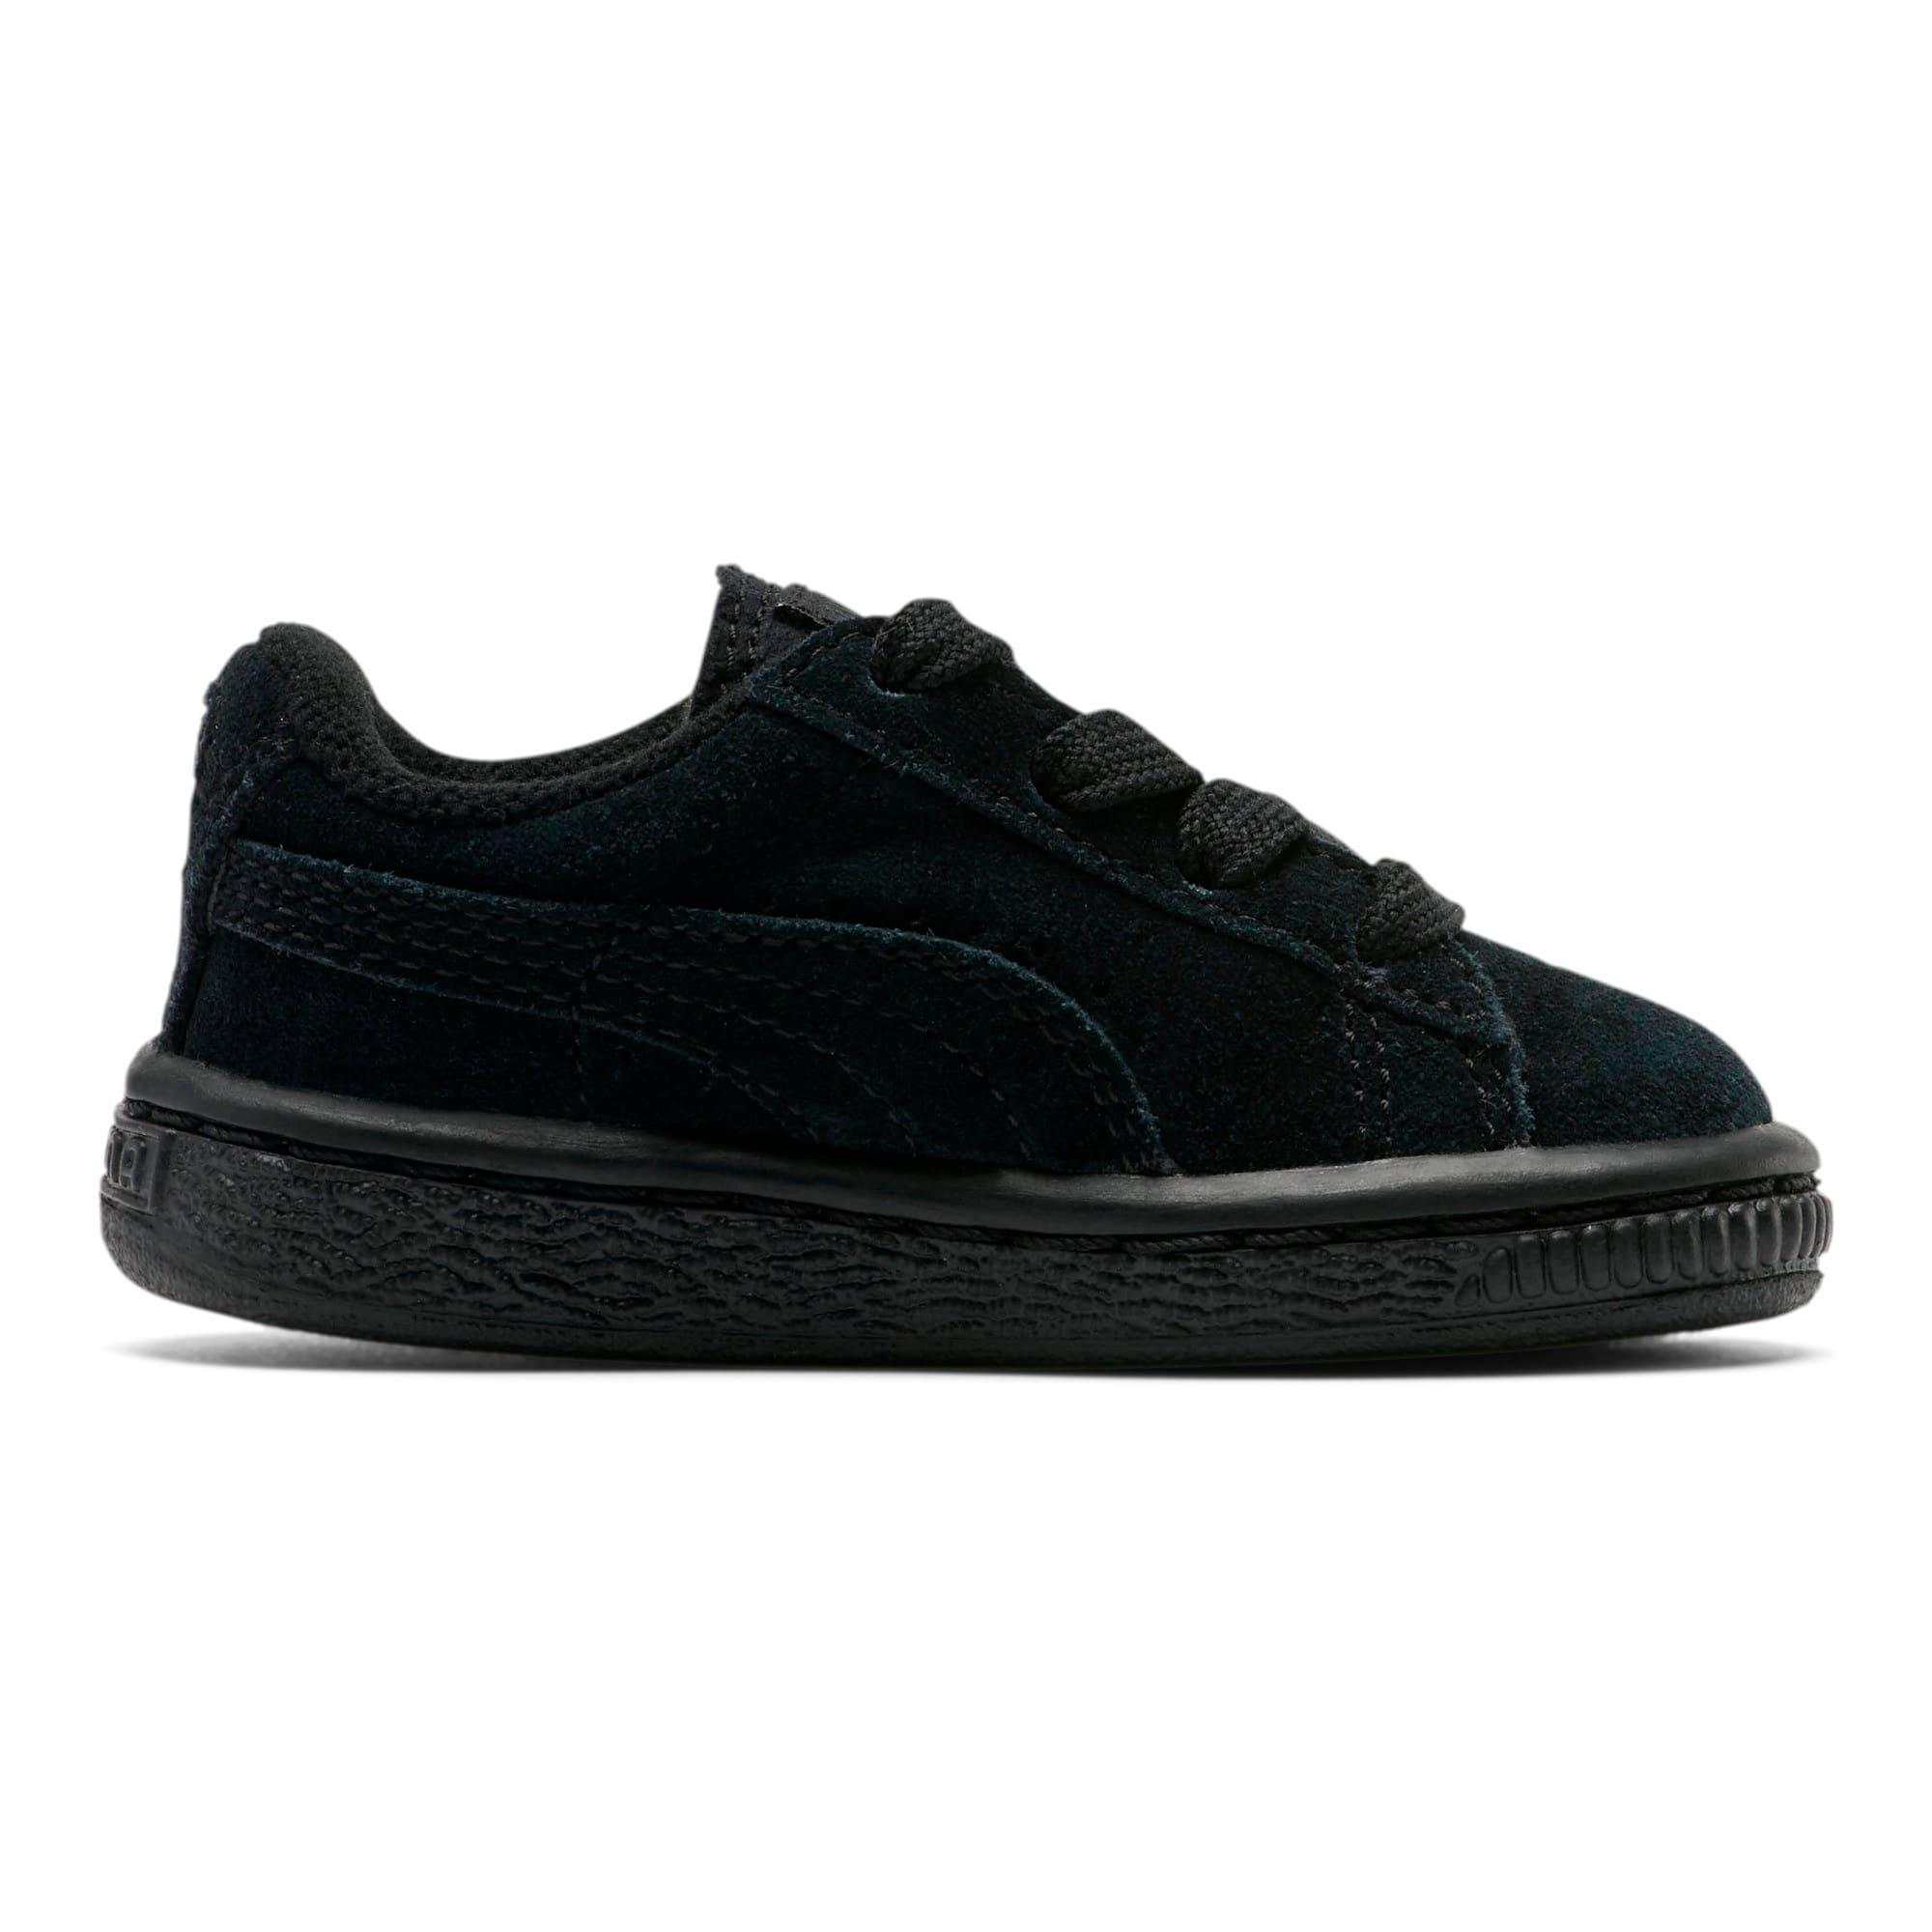 Thumbnail 4 of Puma Suede Toddler Shoes, black-puma silver, medium